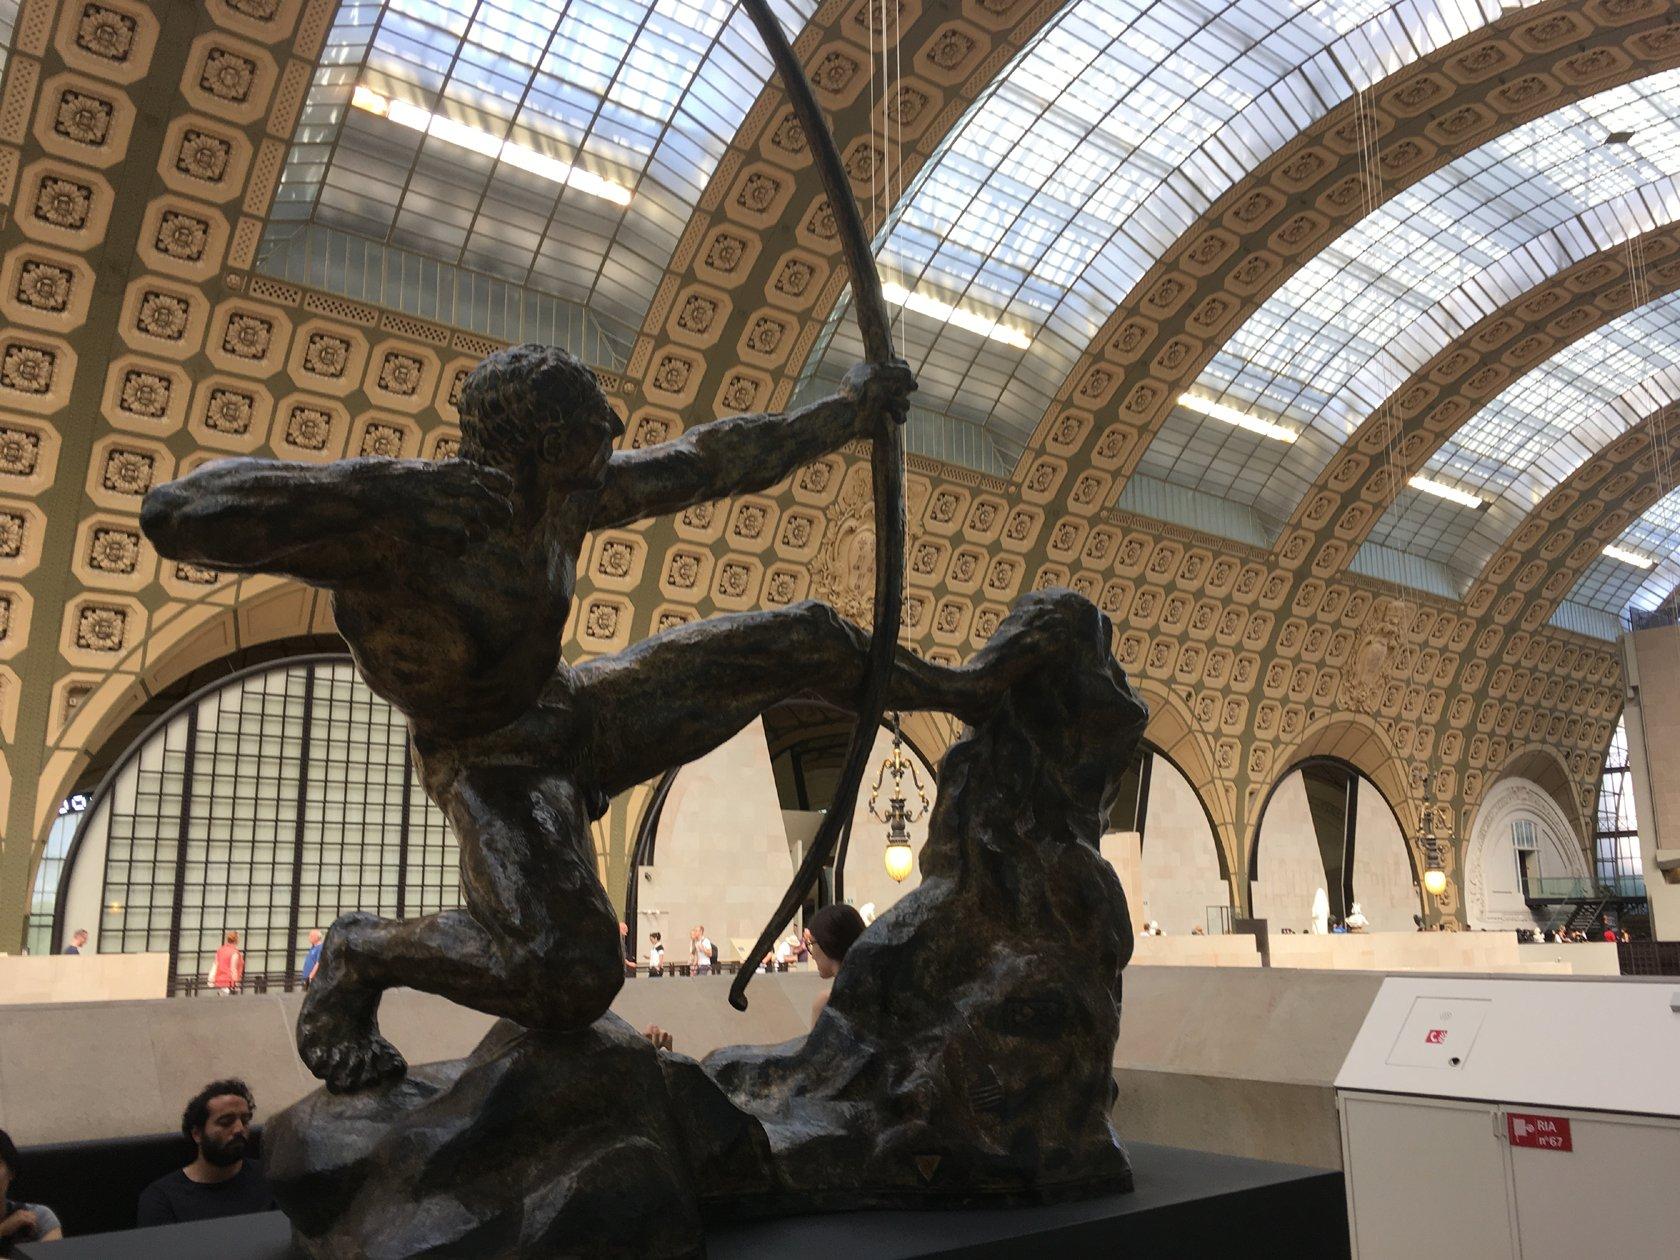 Emile-Antoine Bourdelle: Herakles der Bogenschütze (Musée d'Orsay) - (c) Marcus Heinke